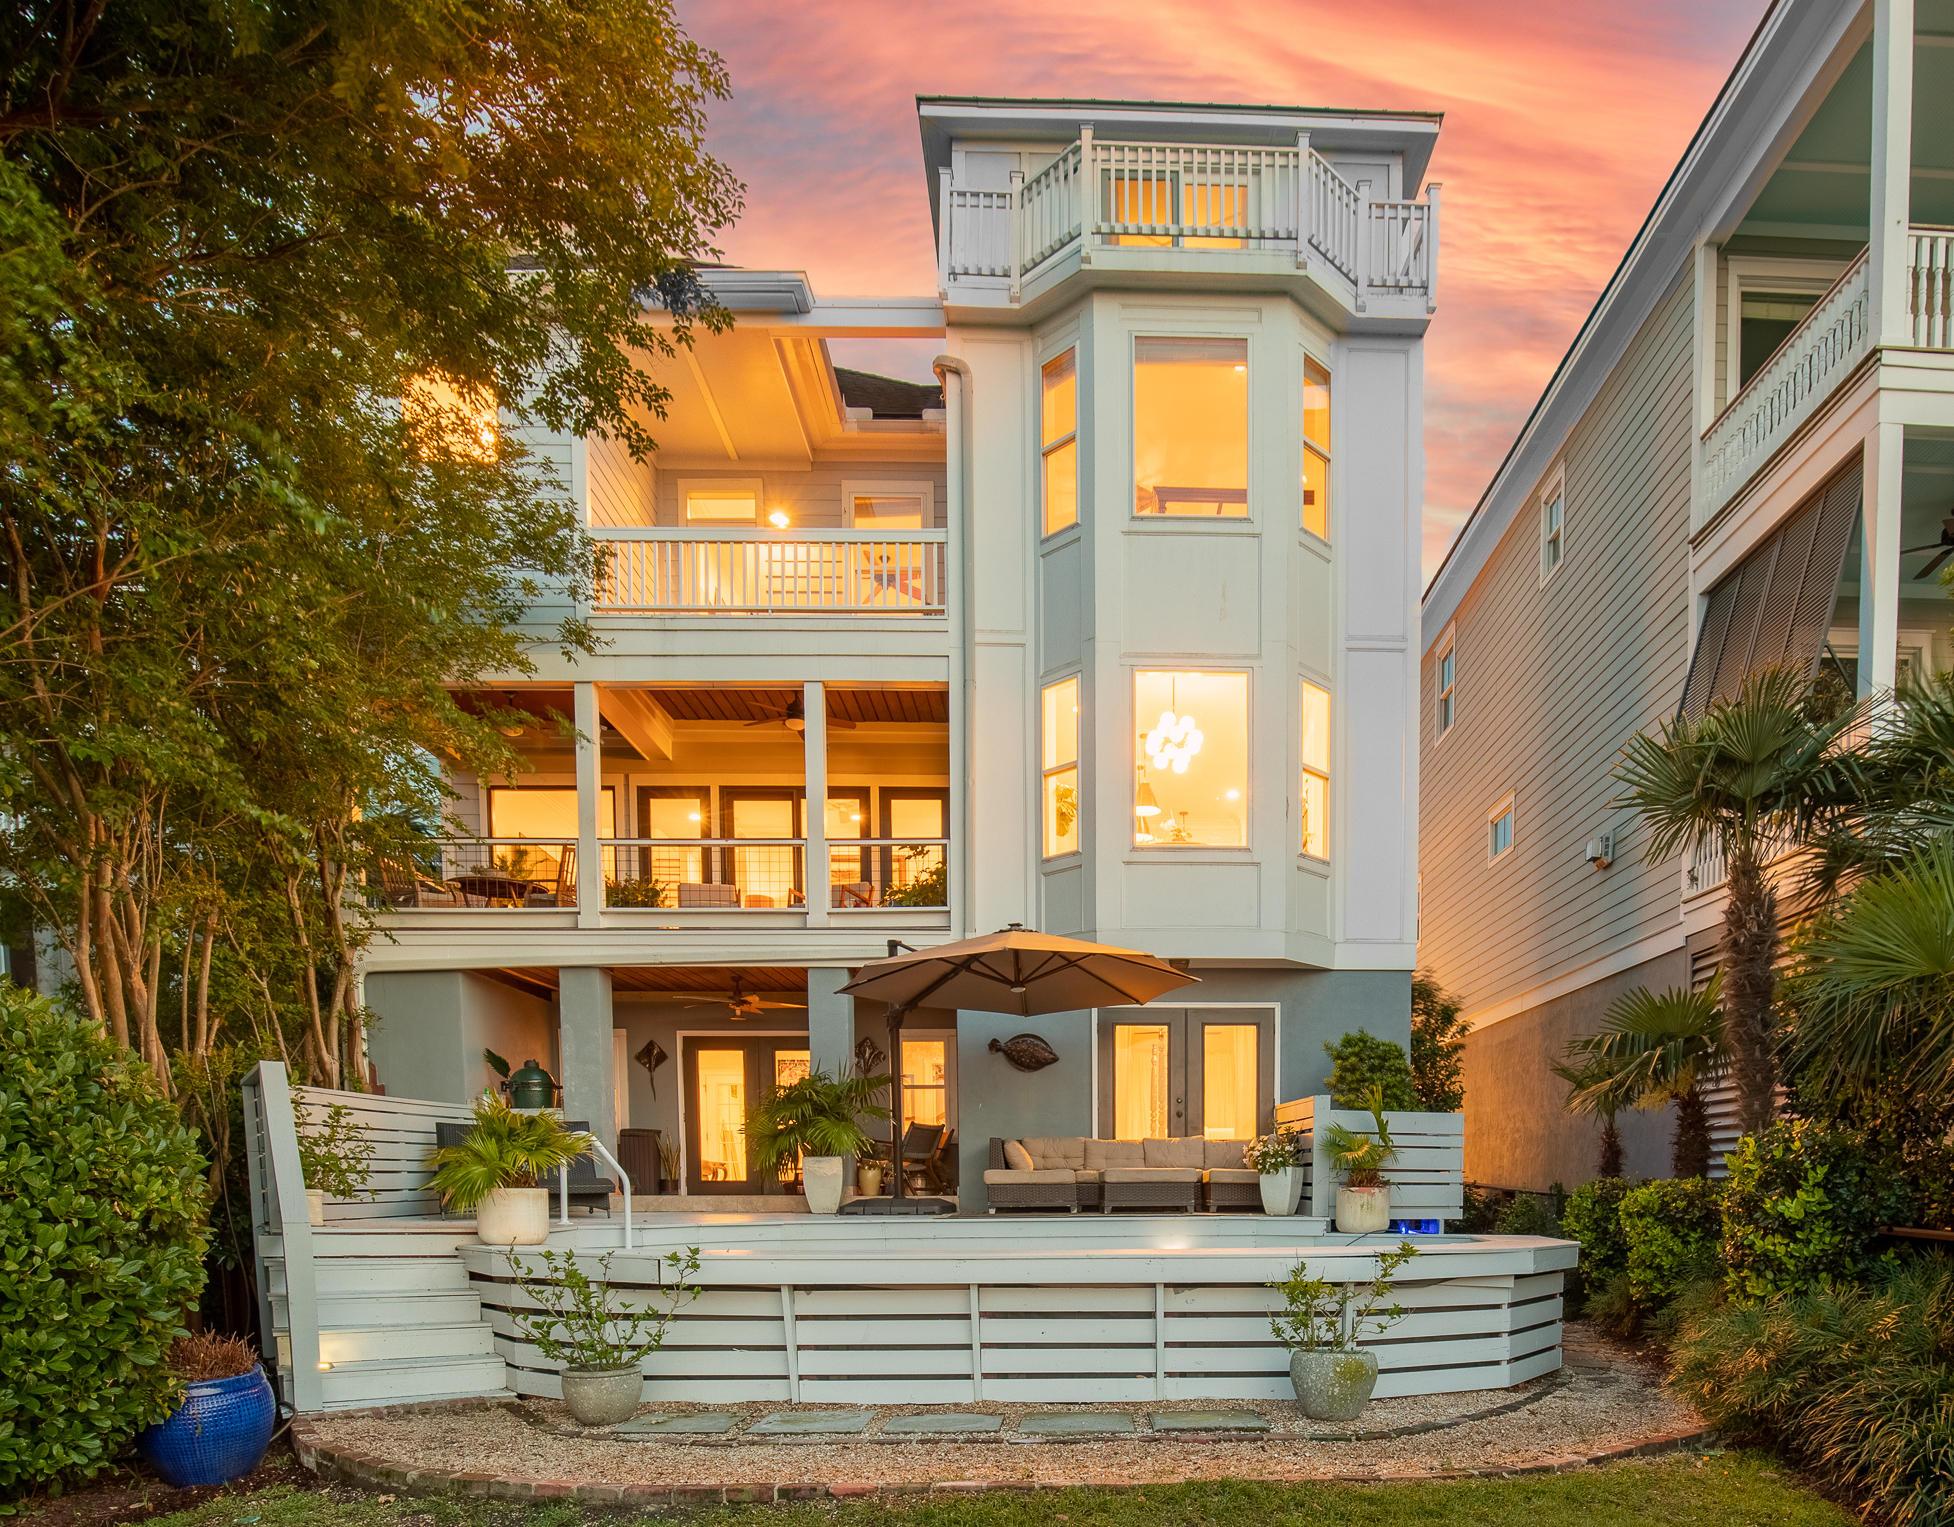 4 Parrothead Lane Charleston, SC 29403